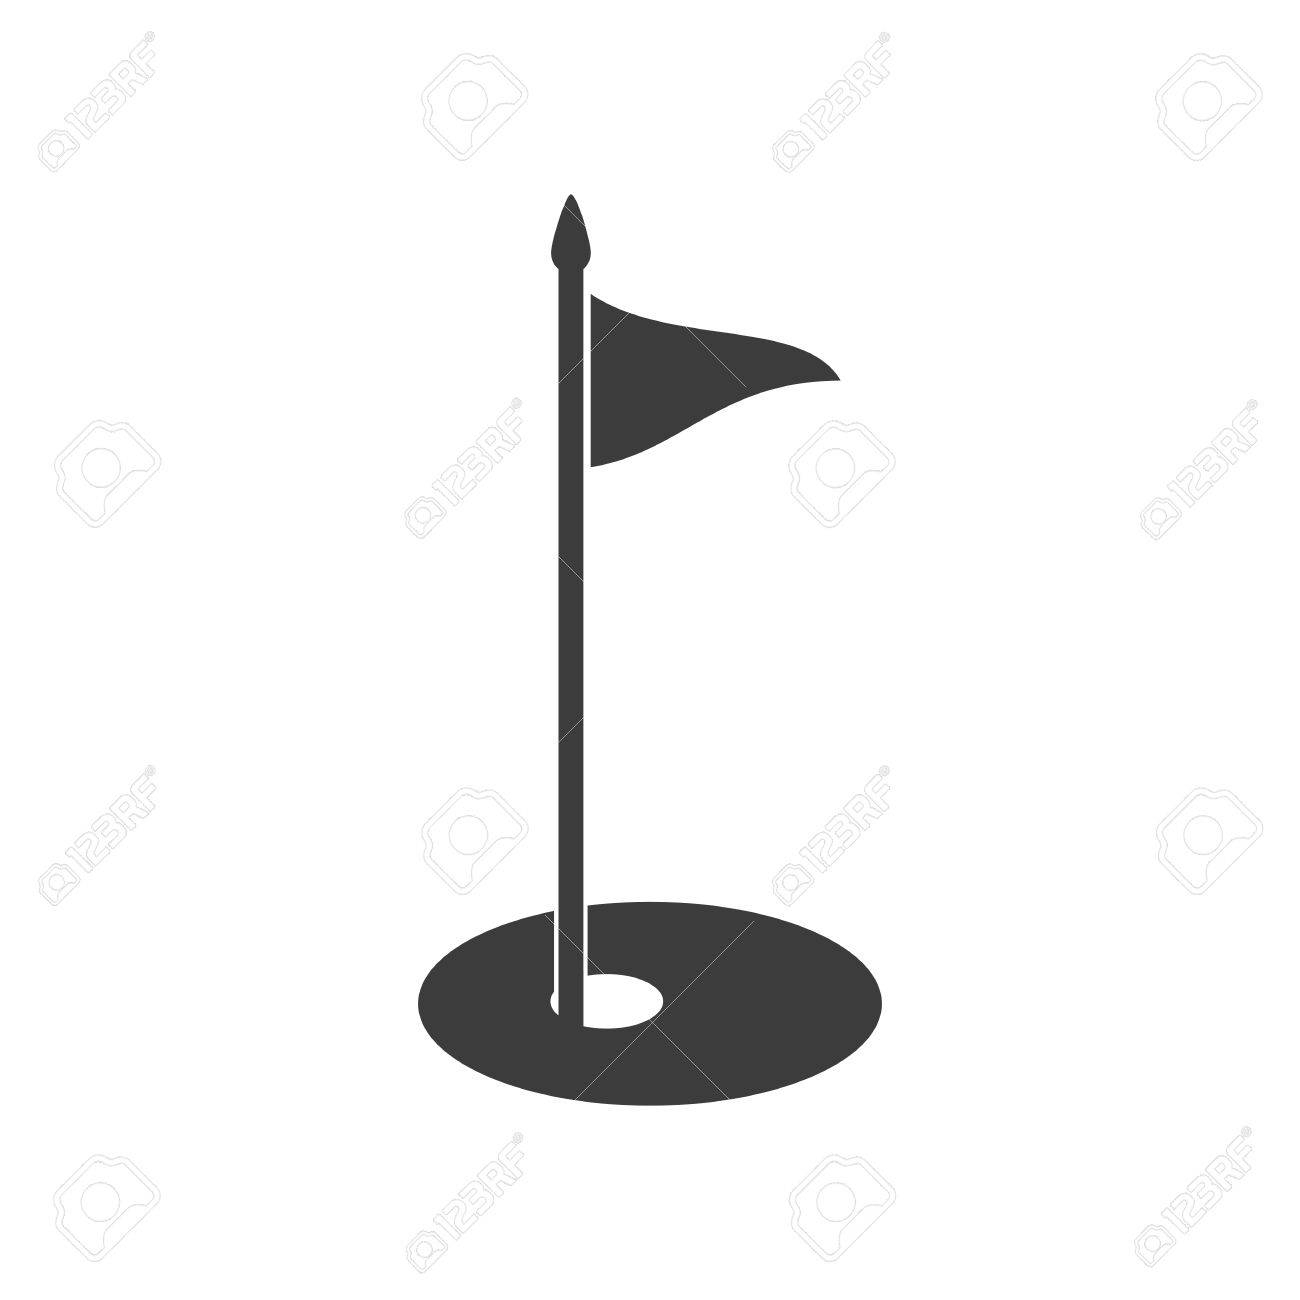 golf flag icon golf flag vector isolated on white background rh 123rf com golf vector free golf victory long sleeve polo